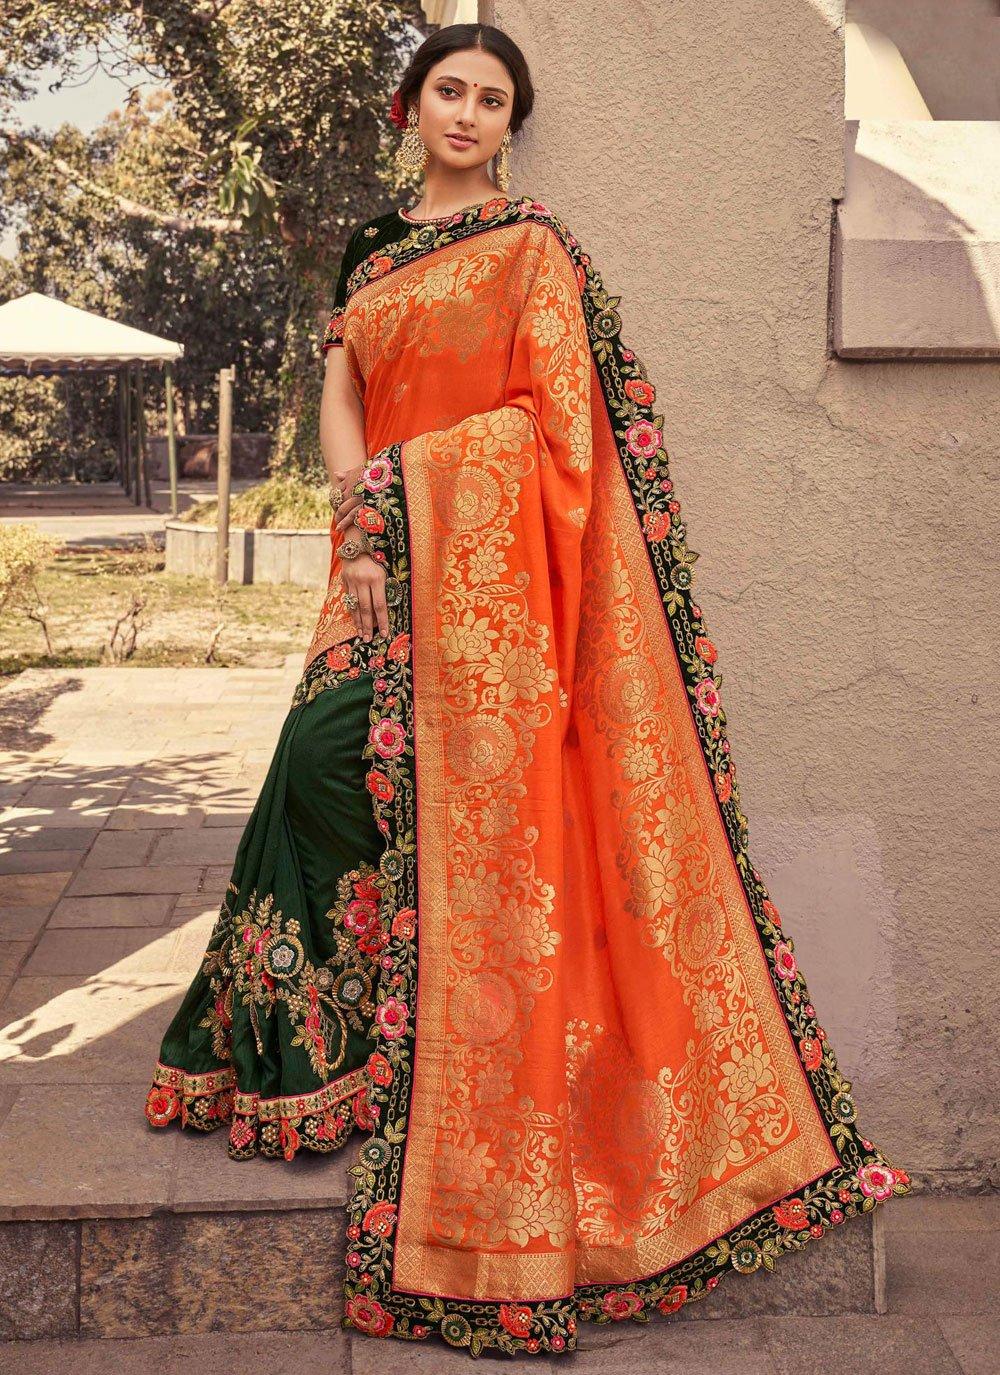 Designer Half N Half Saree Patch Border Fancy Fabric in Green and Orange